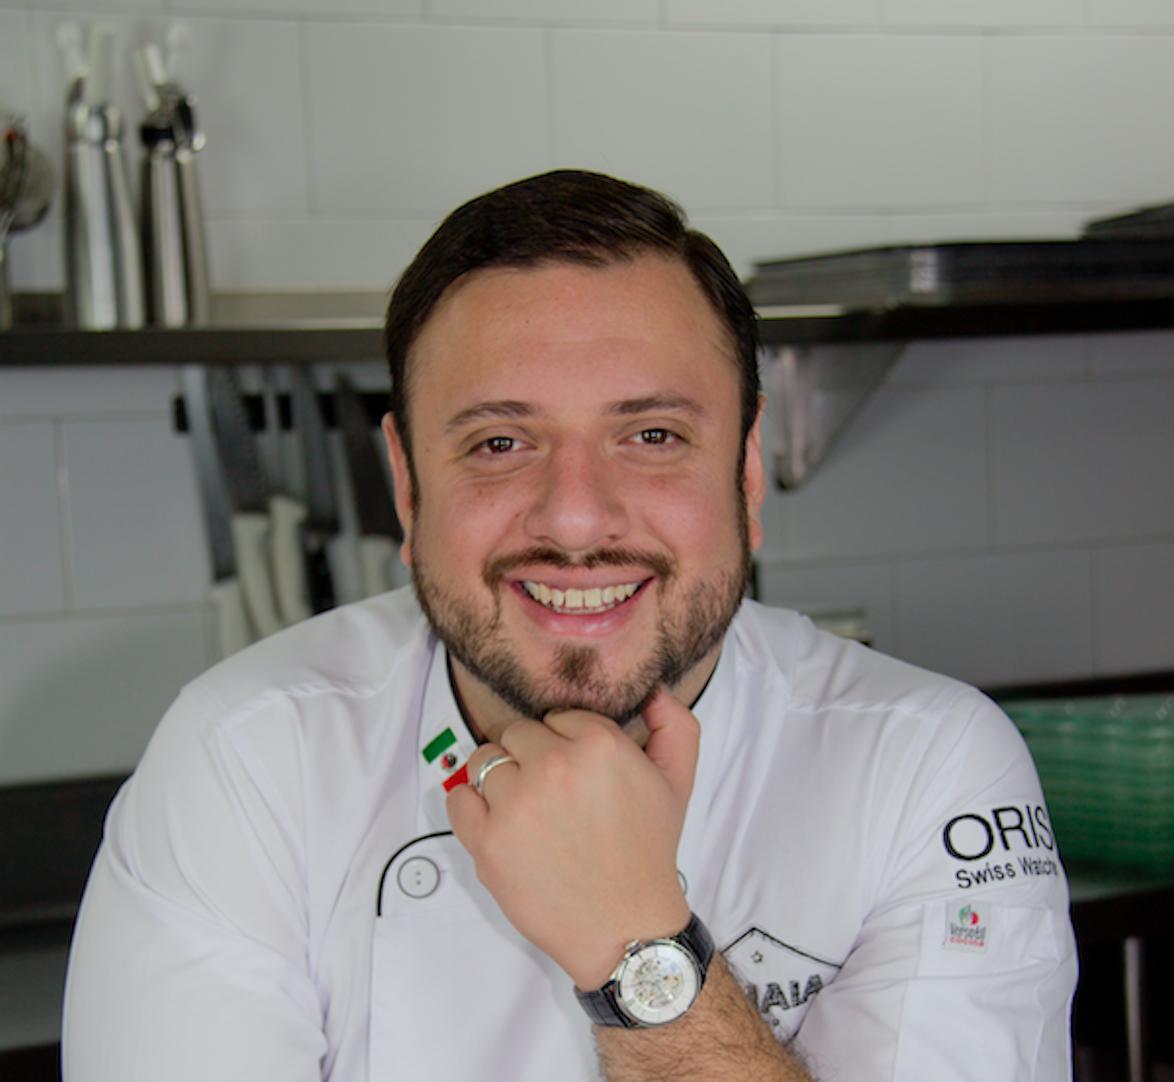 Poncho-Oris-Mexicano-Latinoamericano-marca-internacional-lider